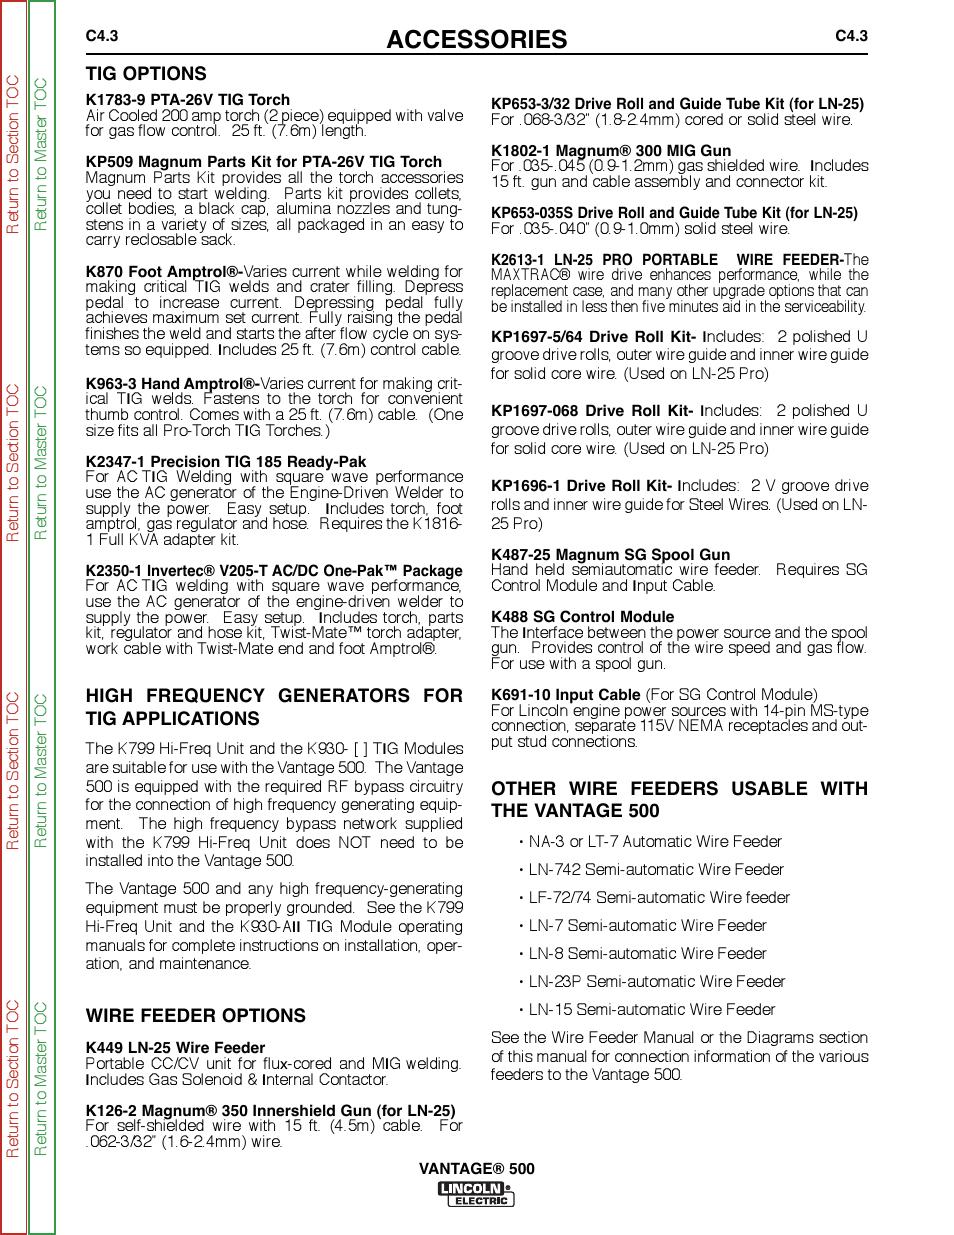 Accessories Lincoln Electric Vantage Svm178 B Manuel Dutilisation K870 Wiring Diagram Page 135 278